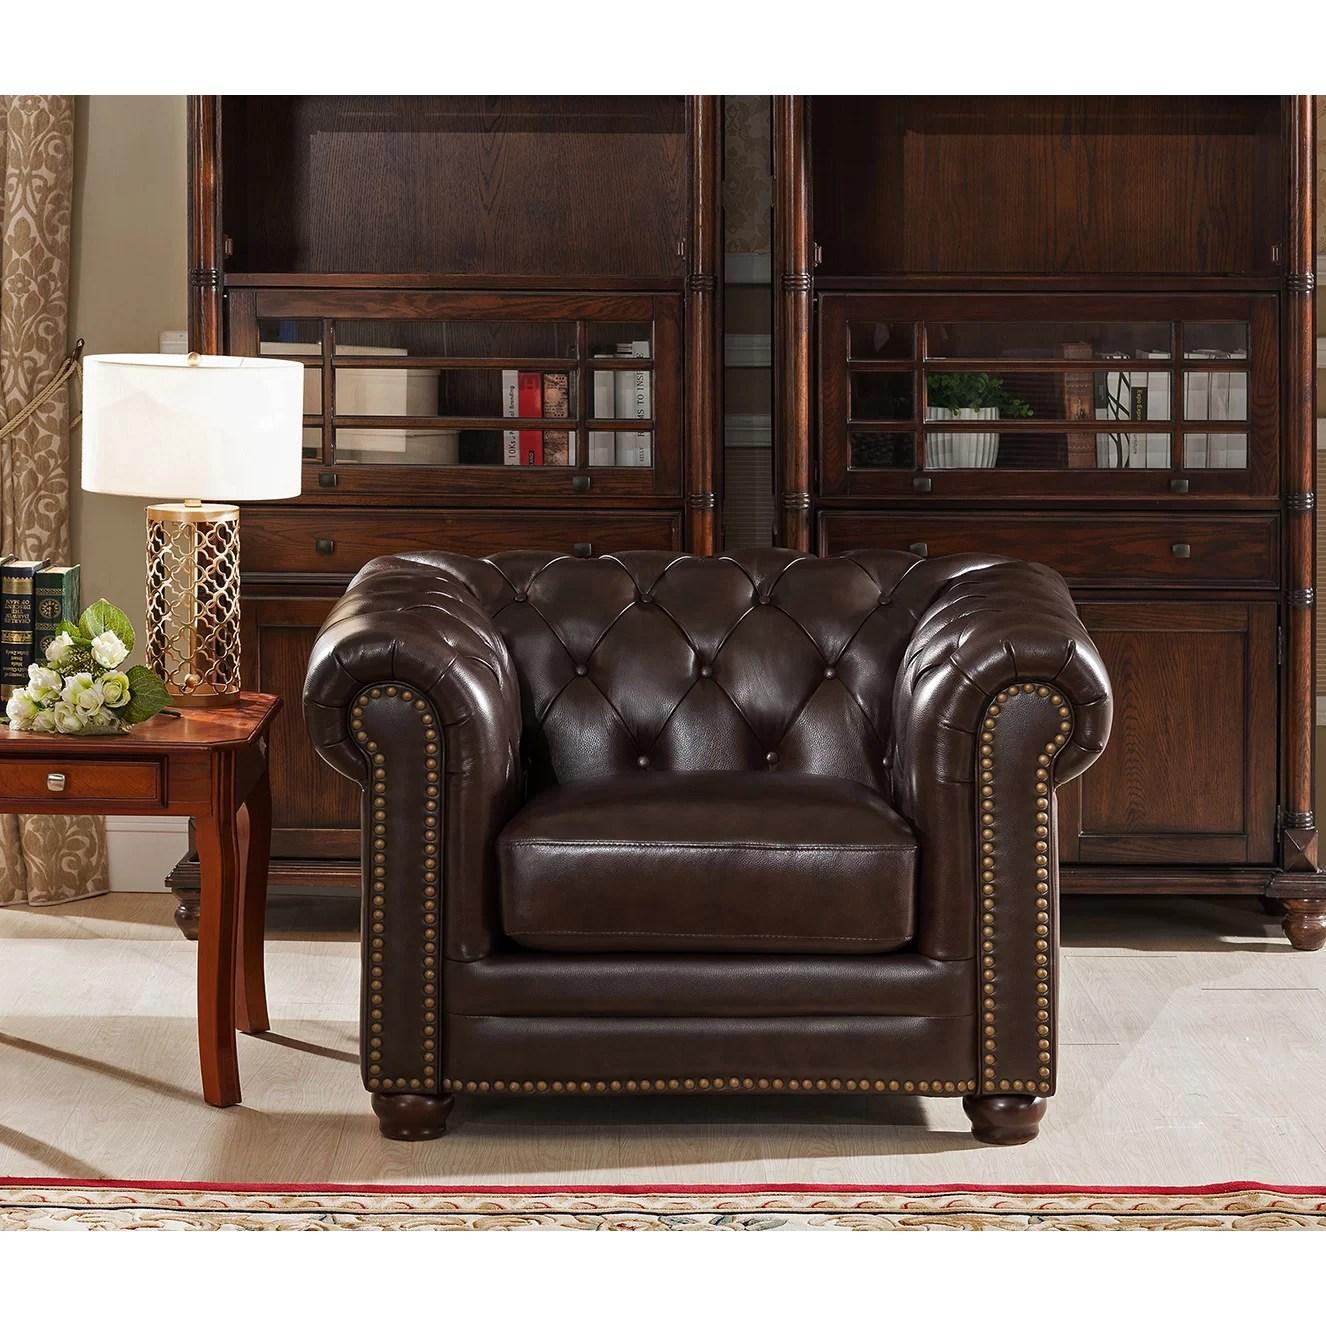 kensington leather chair heated massage pad amax top grain chesterfield sofa